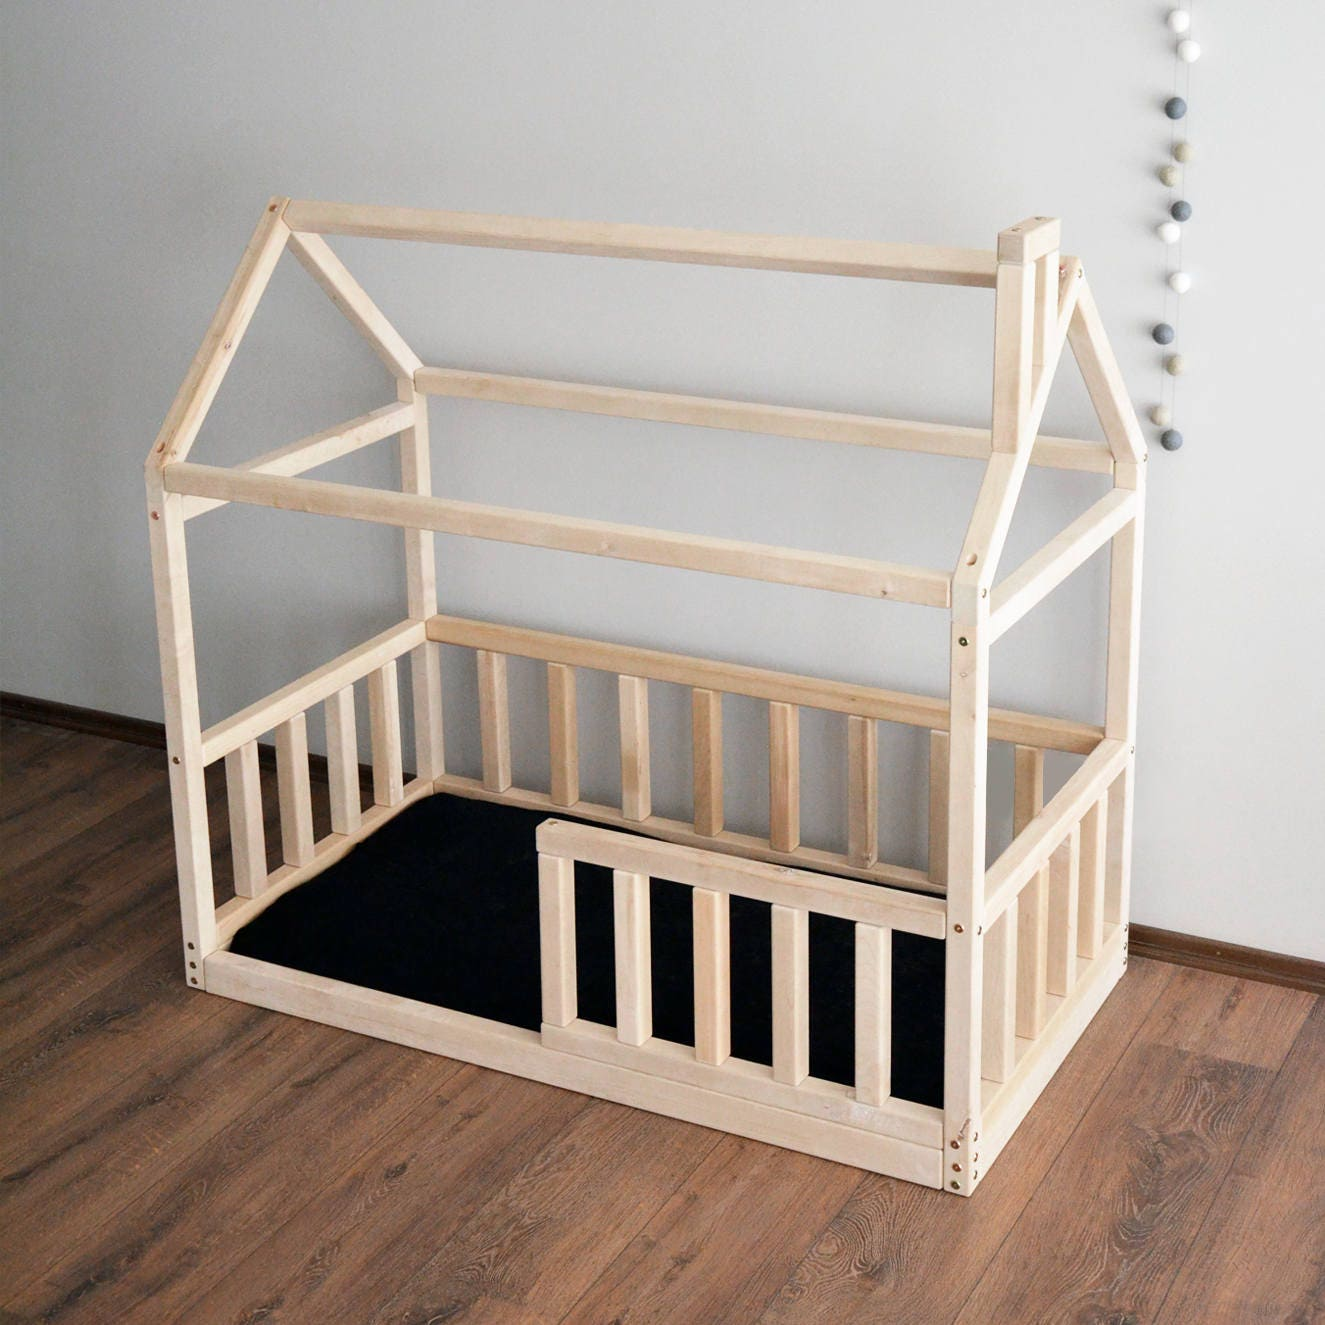 Baby Photo Frame Ideas